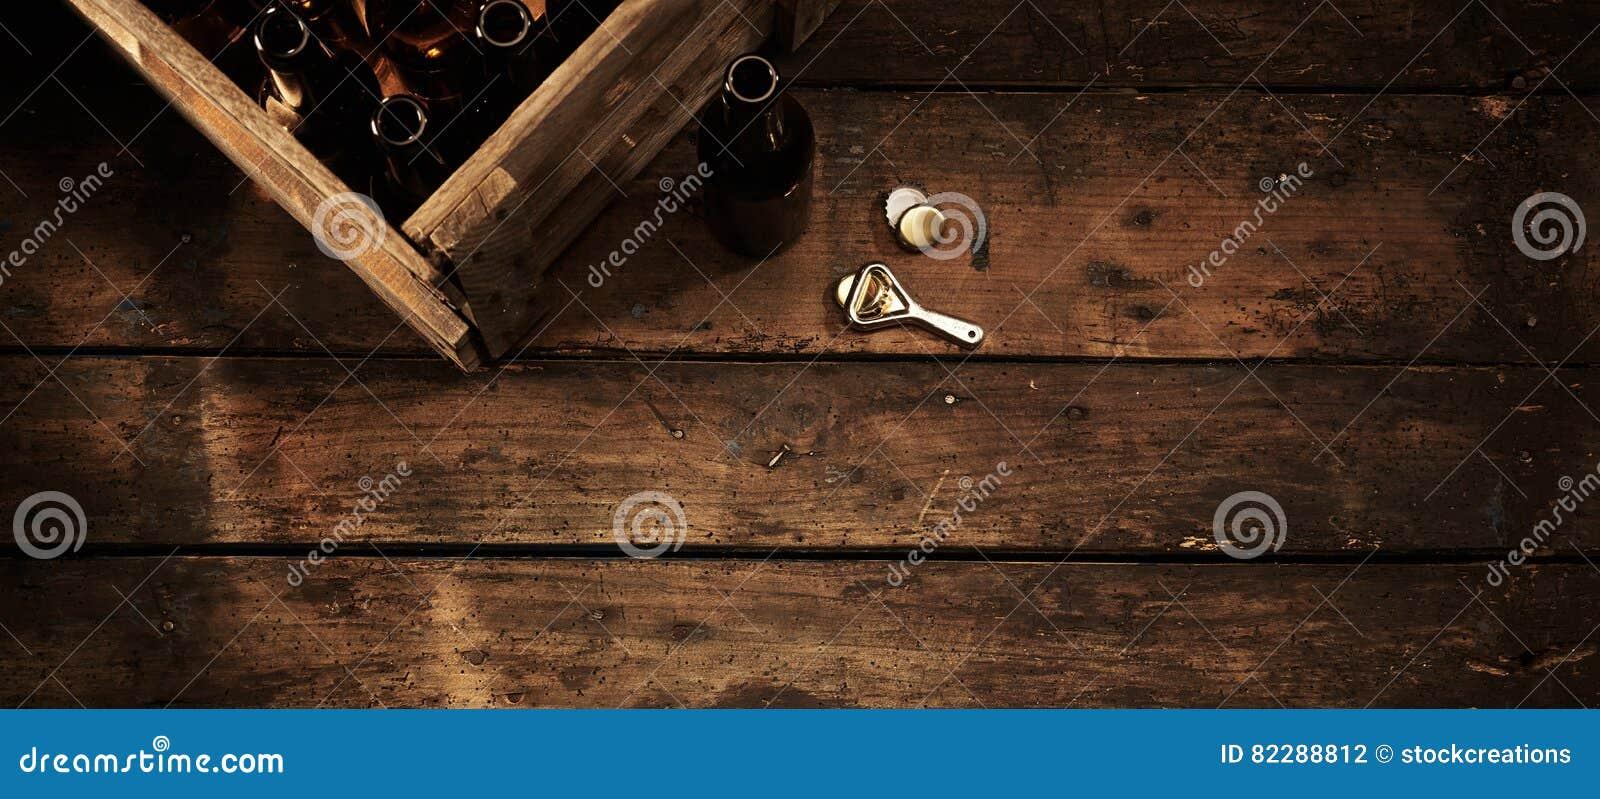 Ölflaskor i en spjällåda i en lantlig bar eller krog